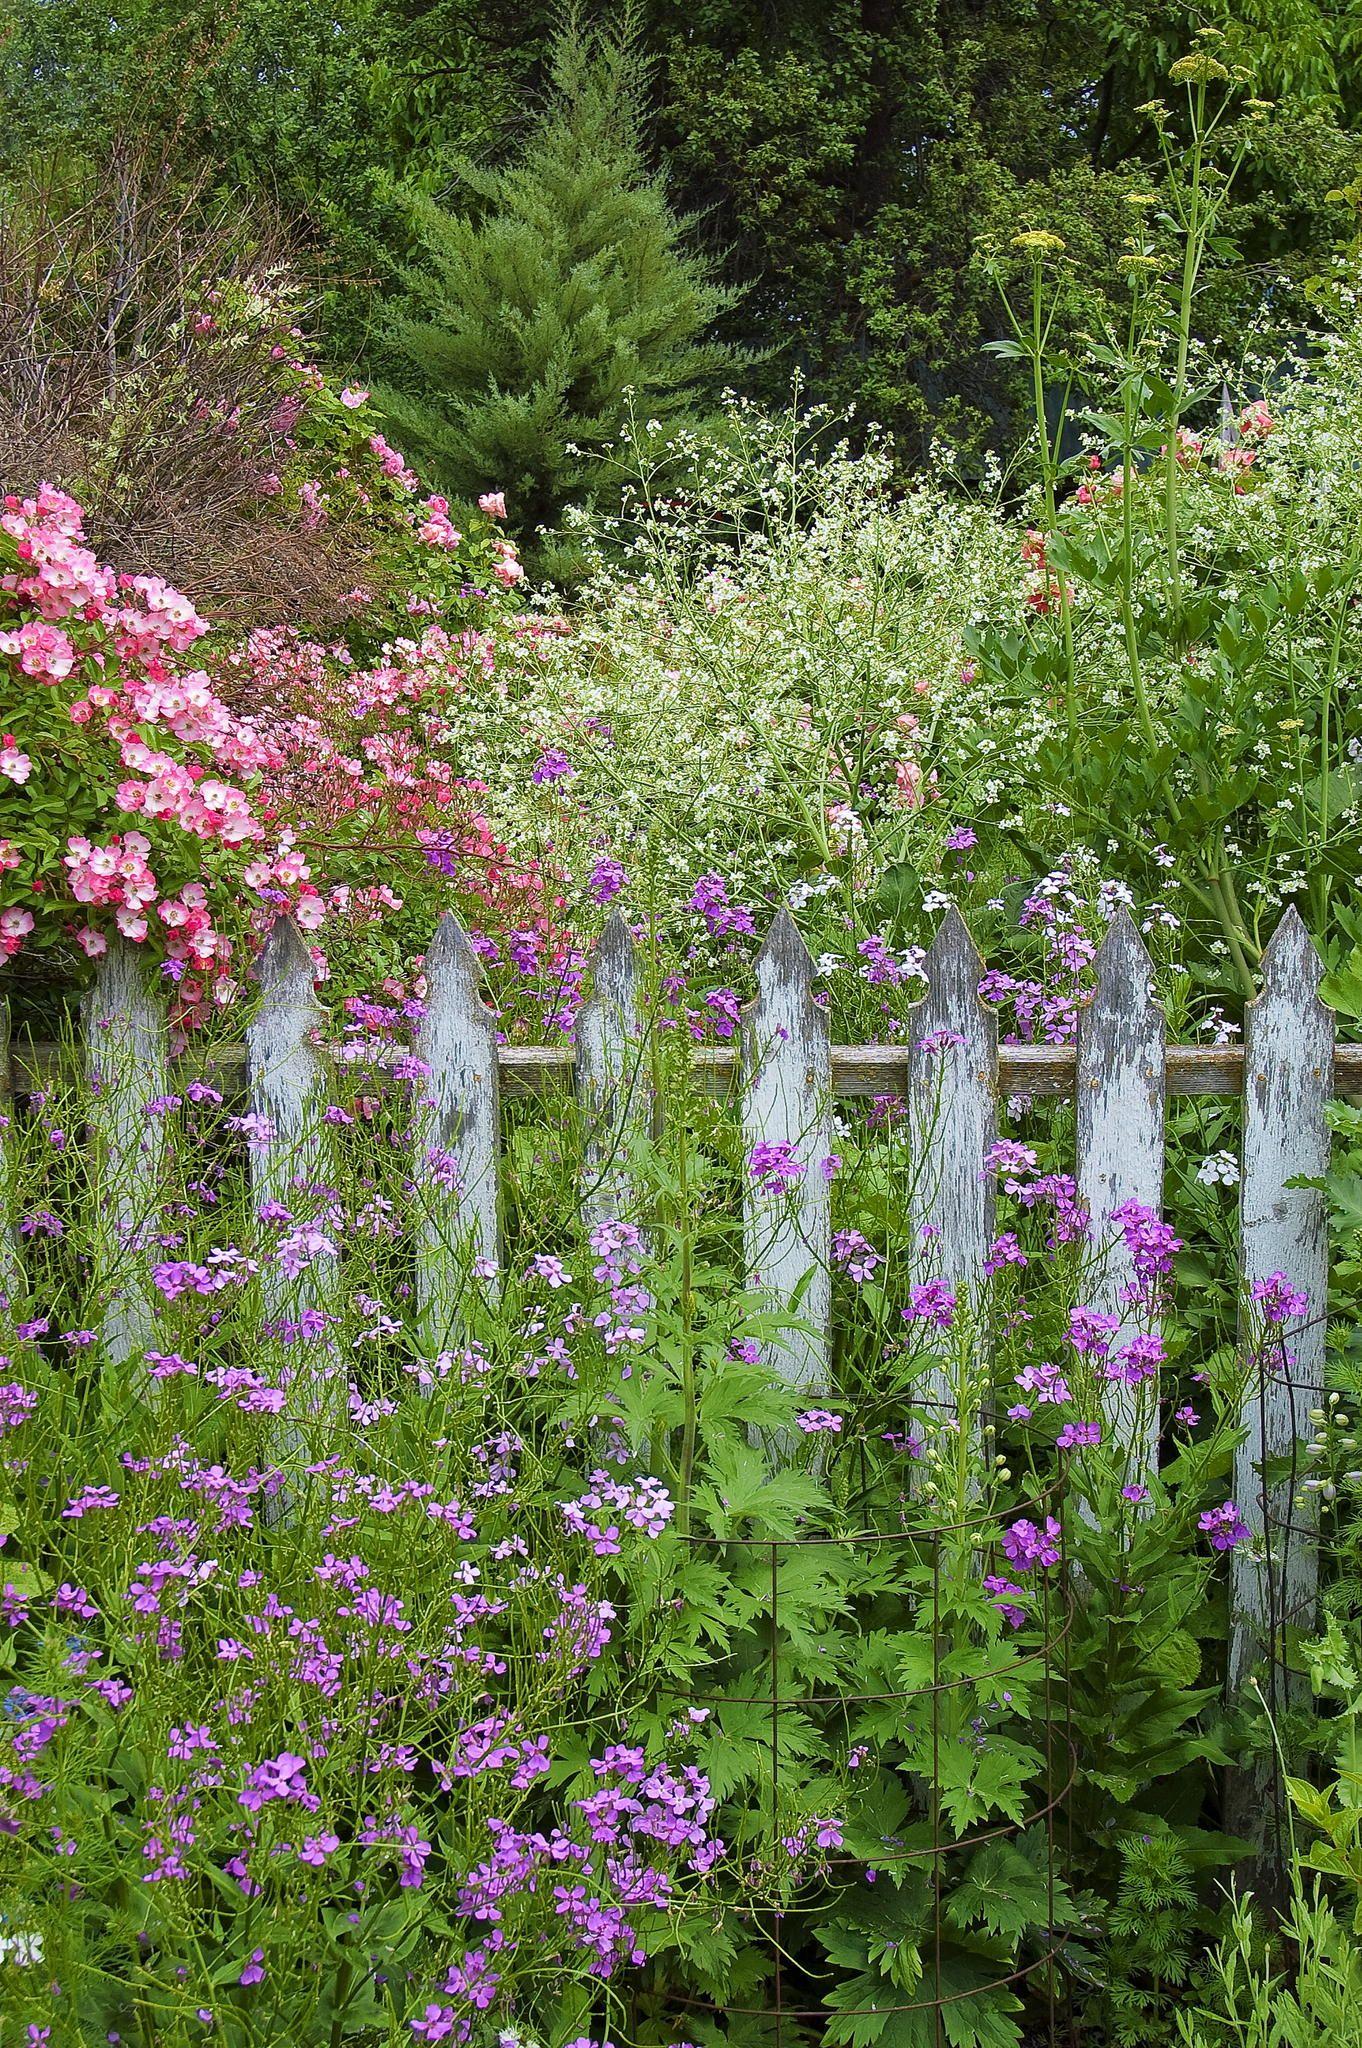 Sharon\'s Garden by Shauna Sprunger on 500px | záhrada | Pinterest ...